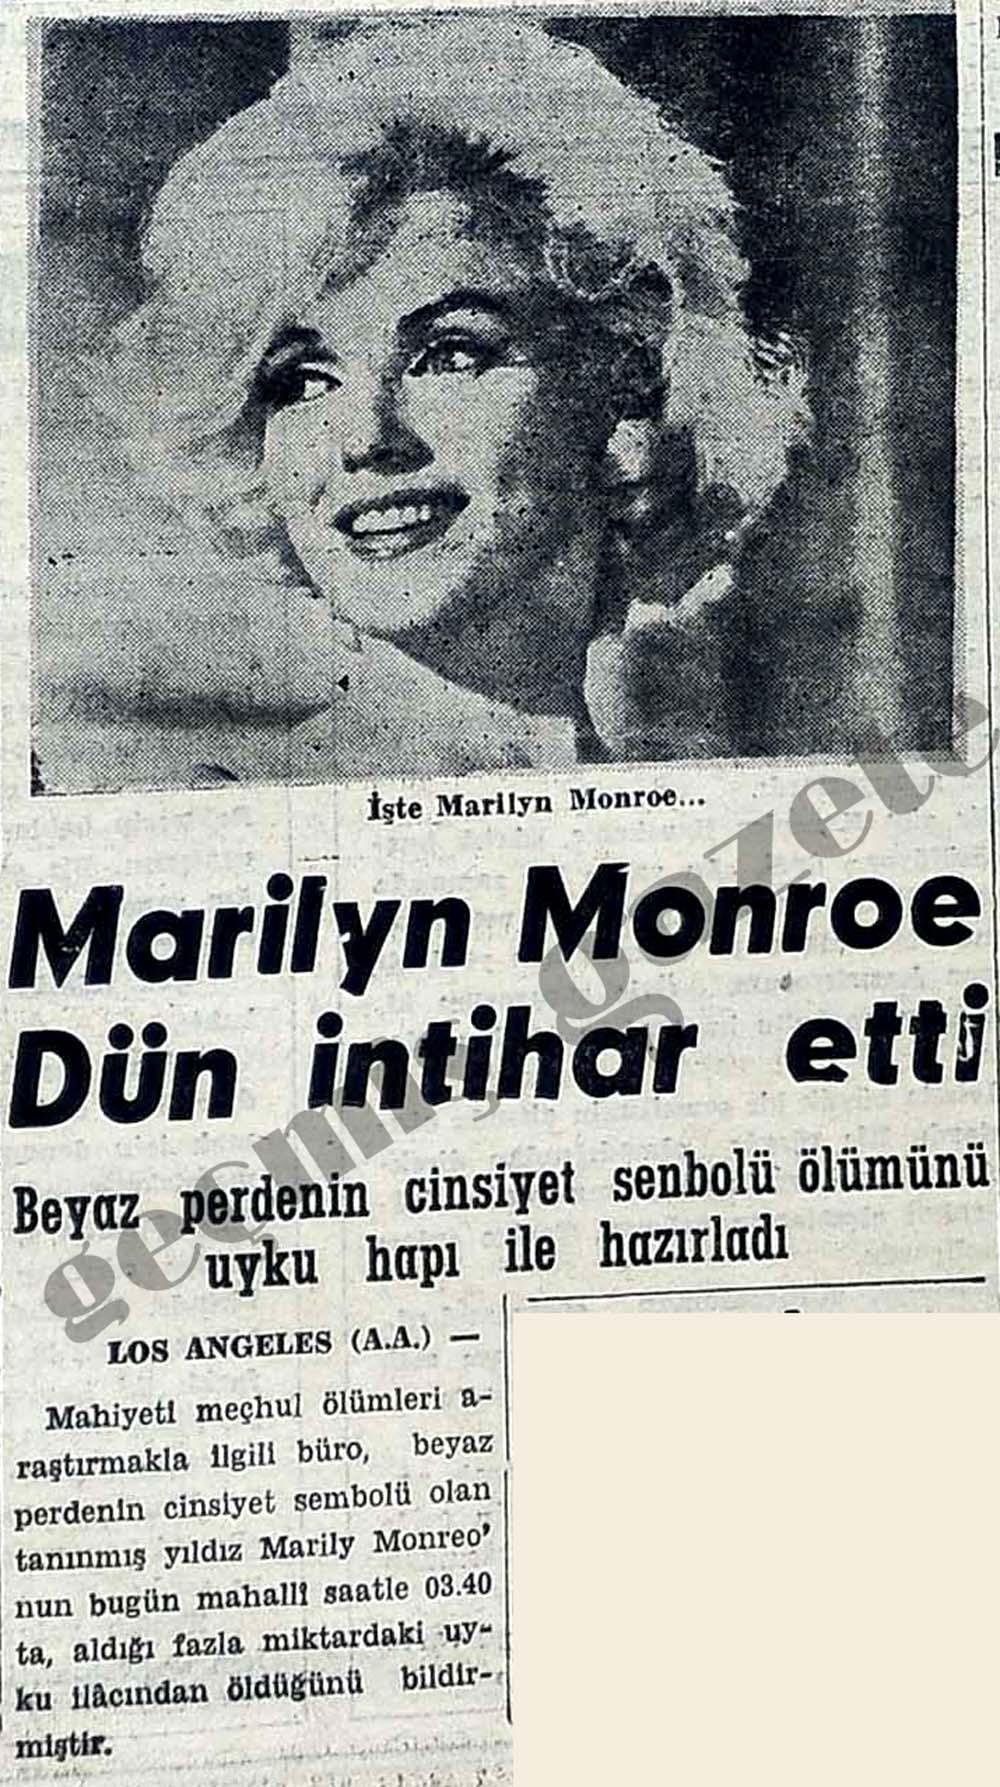 Marilyn Monroe intihar etti